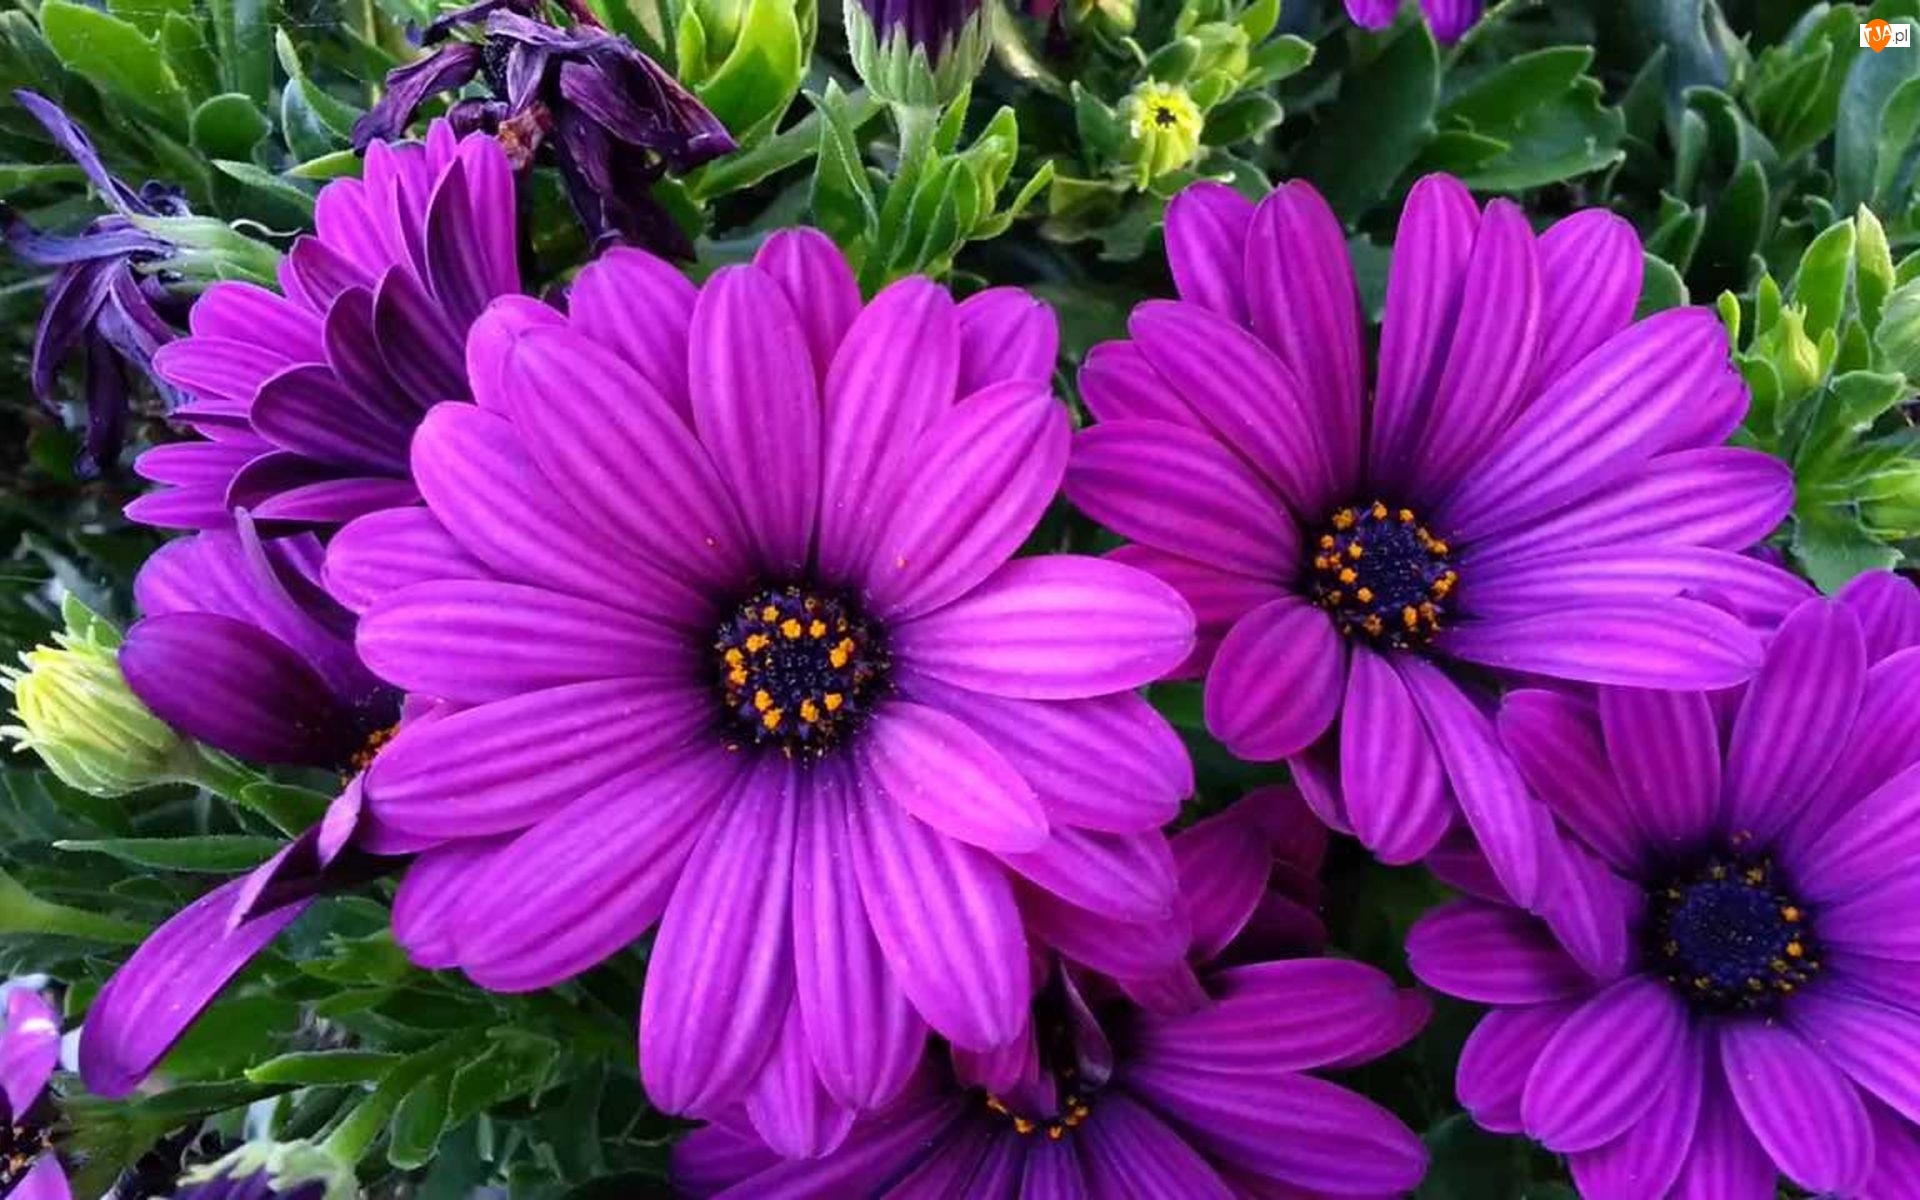 Arktotis, Fioletowe, Kwiaty